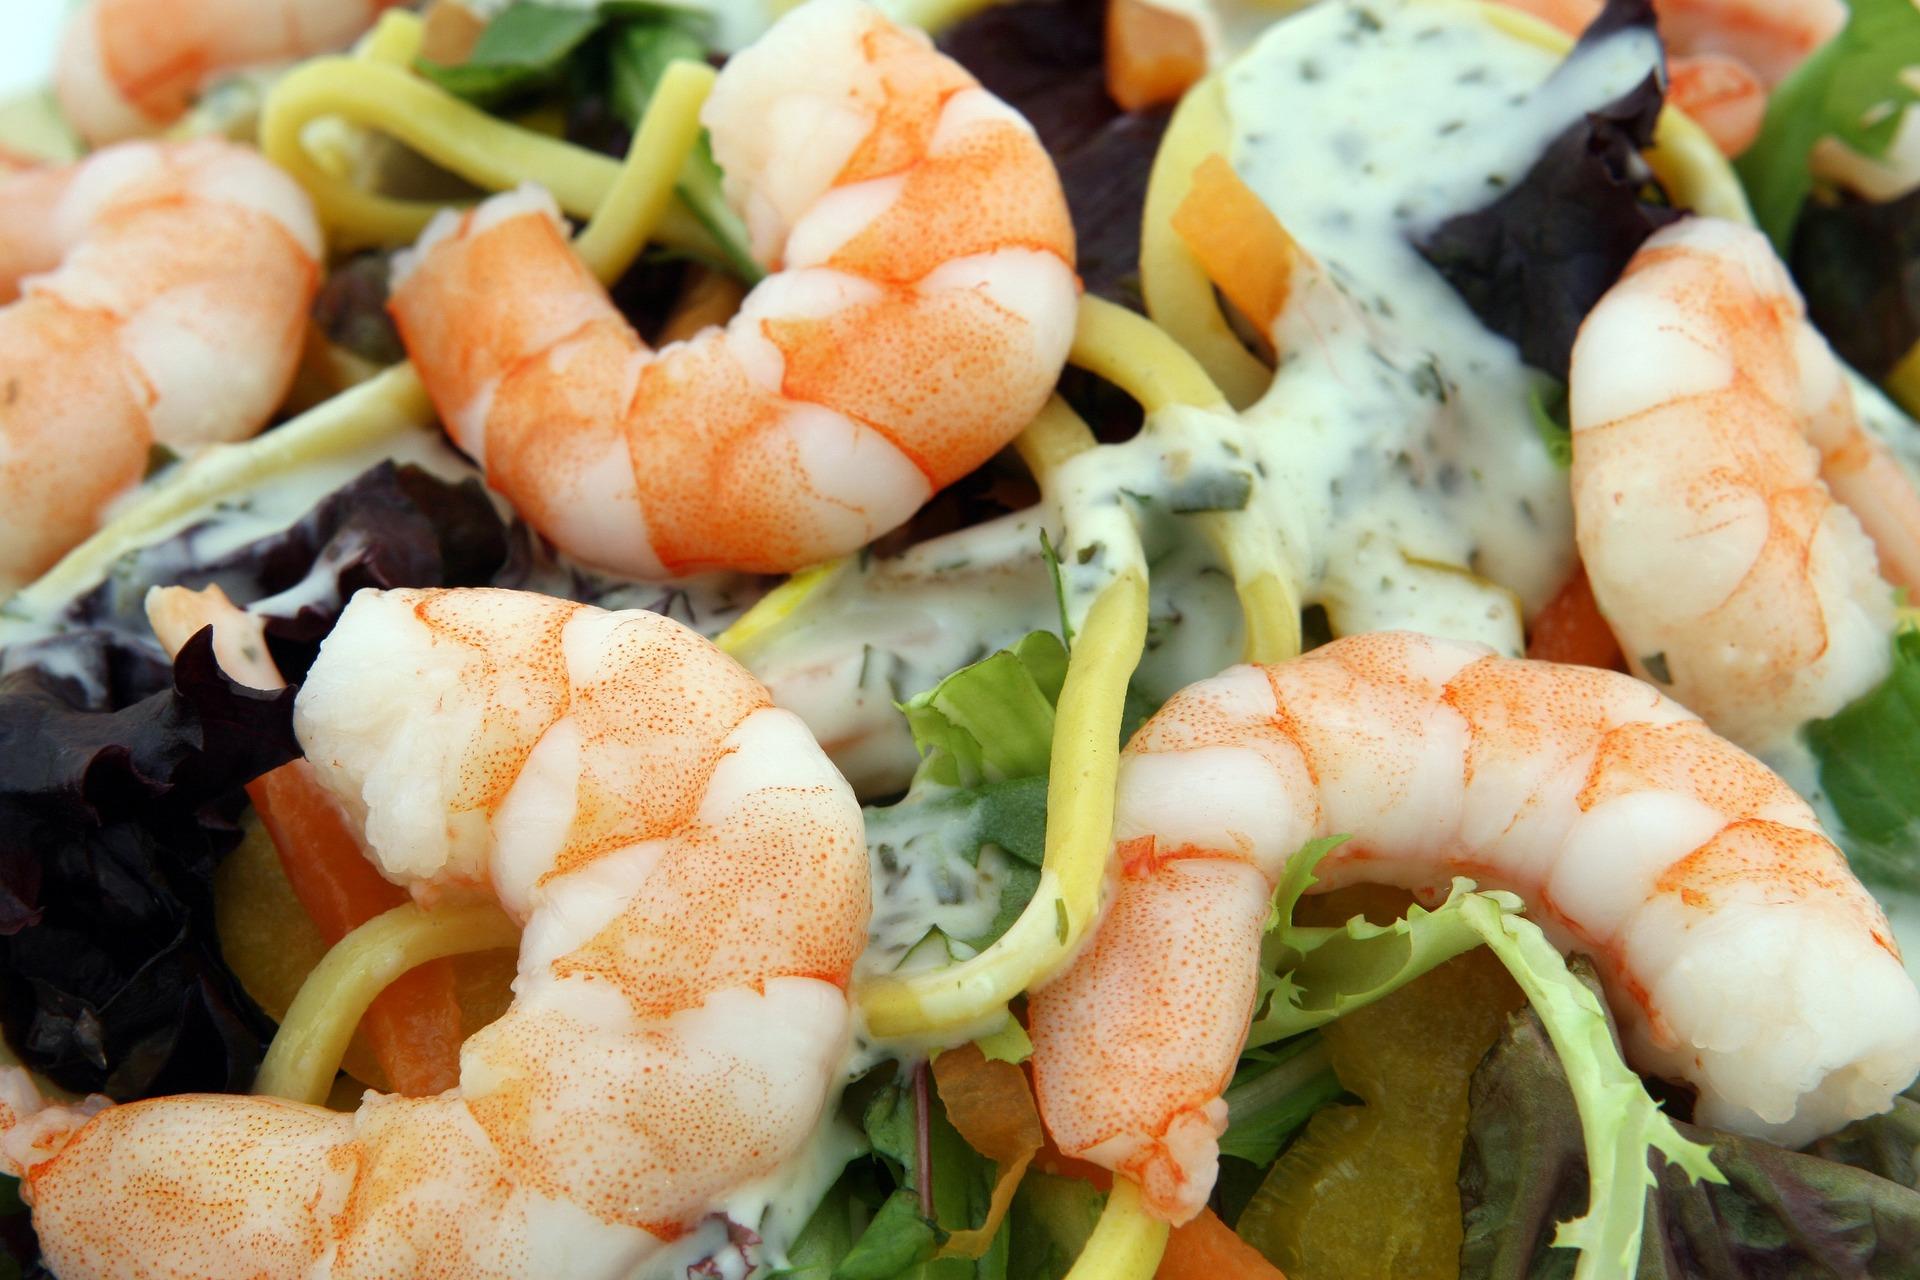 Broccoli and Shrimp Salad